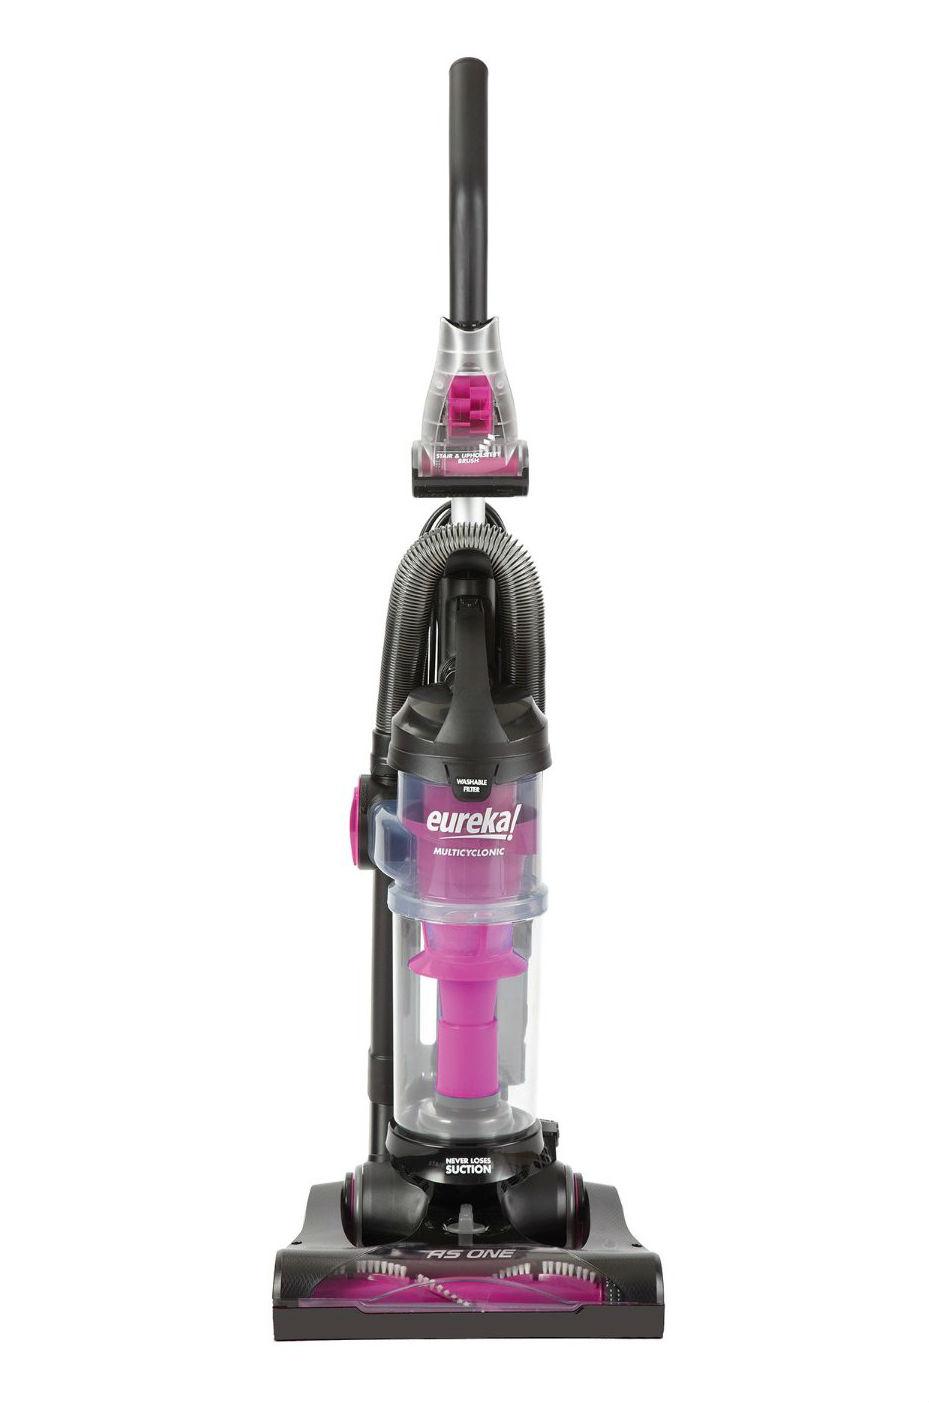 Eureka Vacuum Cleaners  Reviews and Comparisons  Vacuum